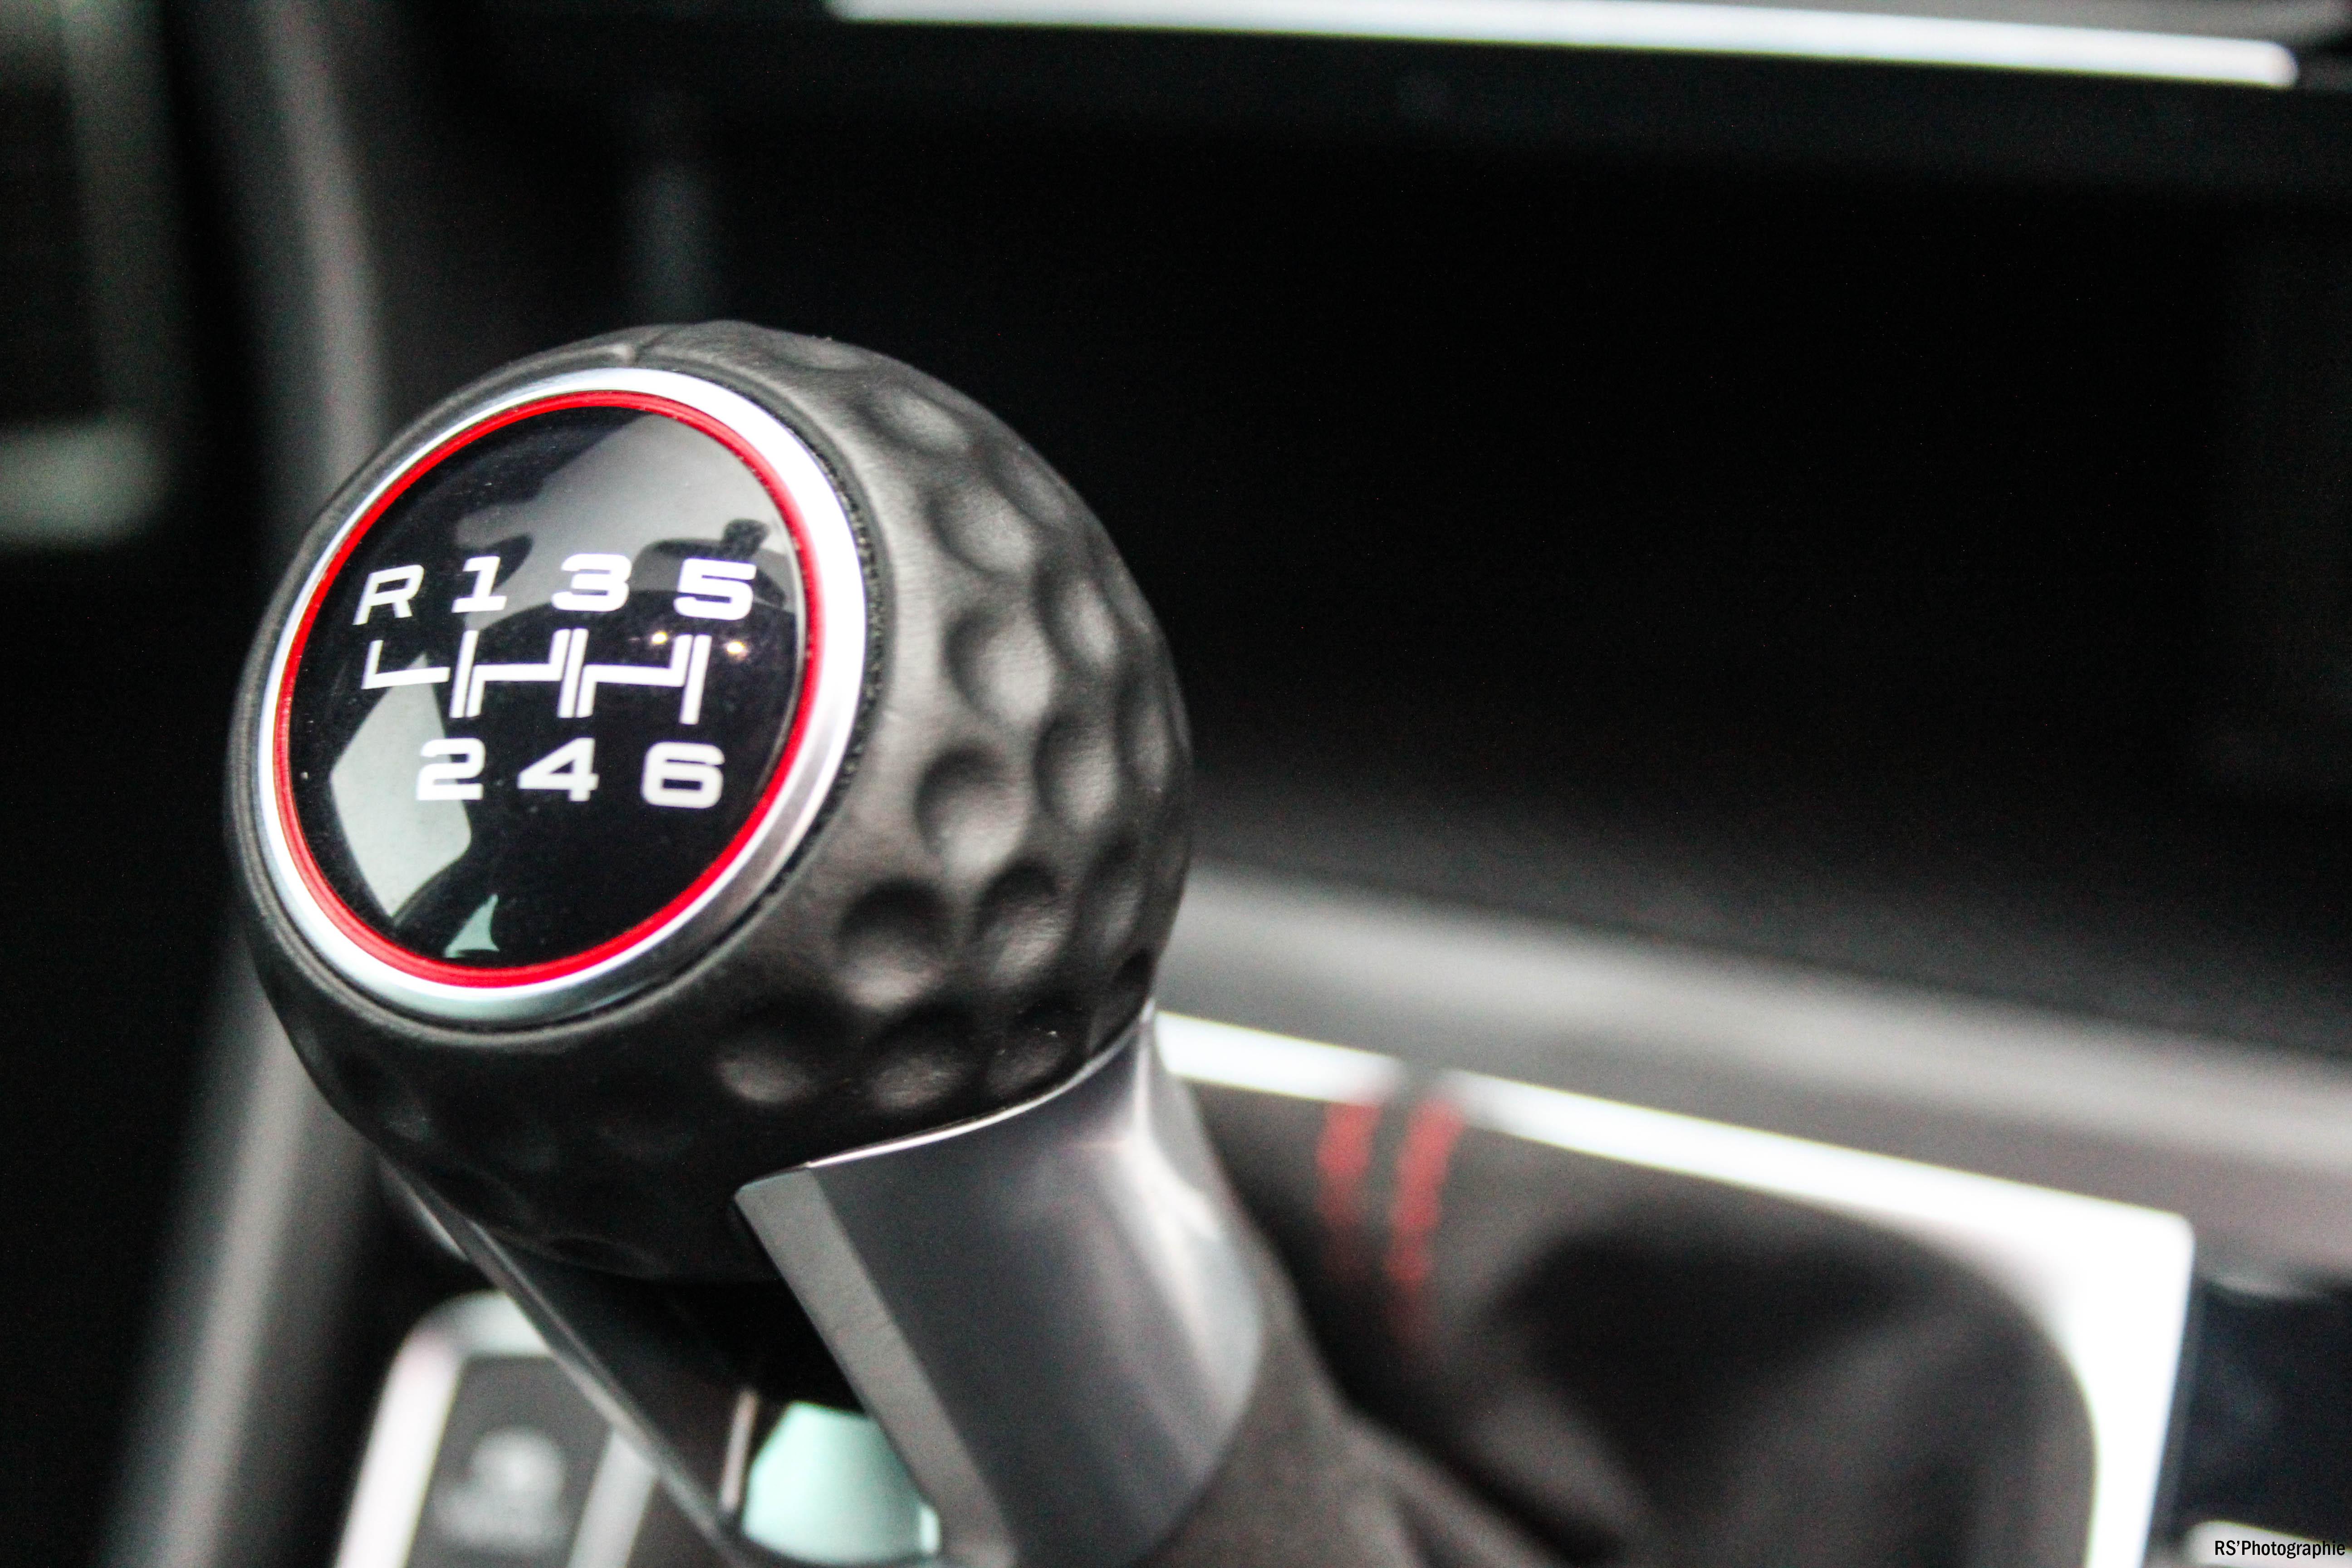 vwgolfgticlubsport12-volkswagen-golf-gti-clubsport-gearshift-arnaud-demasier-rsphotographie